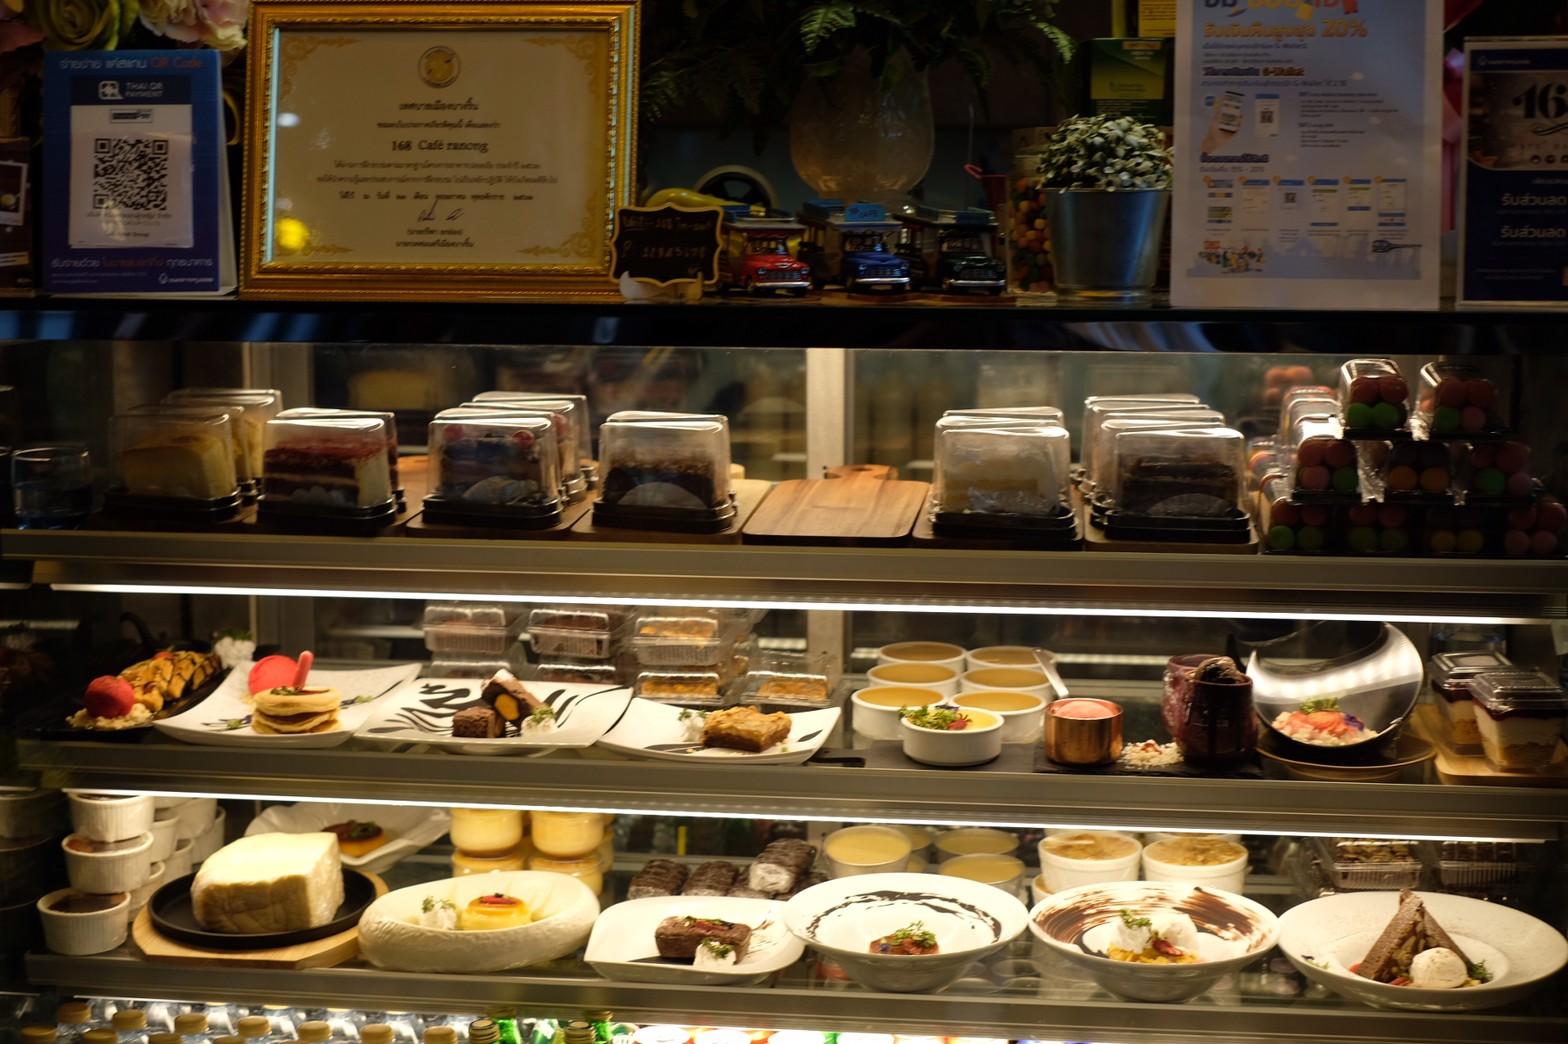 168 Cafe Ranong คาเฟ่ระนอง สวยหรูสไตล์โมเดิร์นทรอปิคอล จะมุมไหนก็ว้าวววว